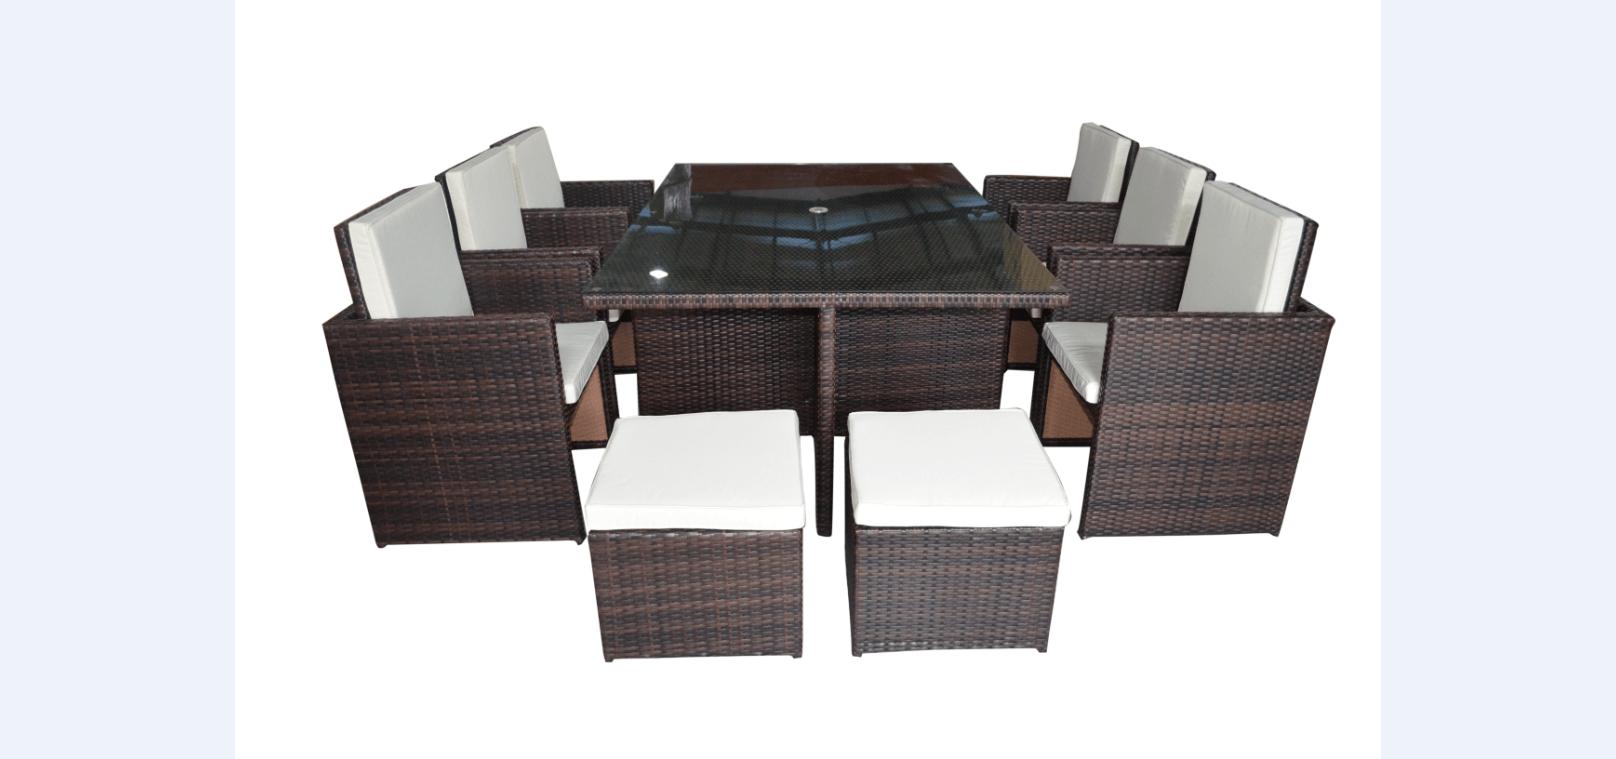 12 Seater Rattan Garden Furniture Set   Marbella Range